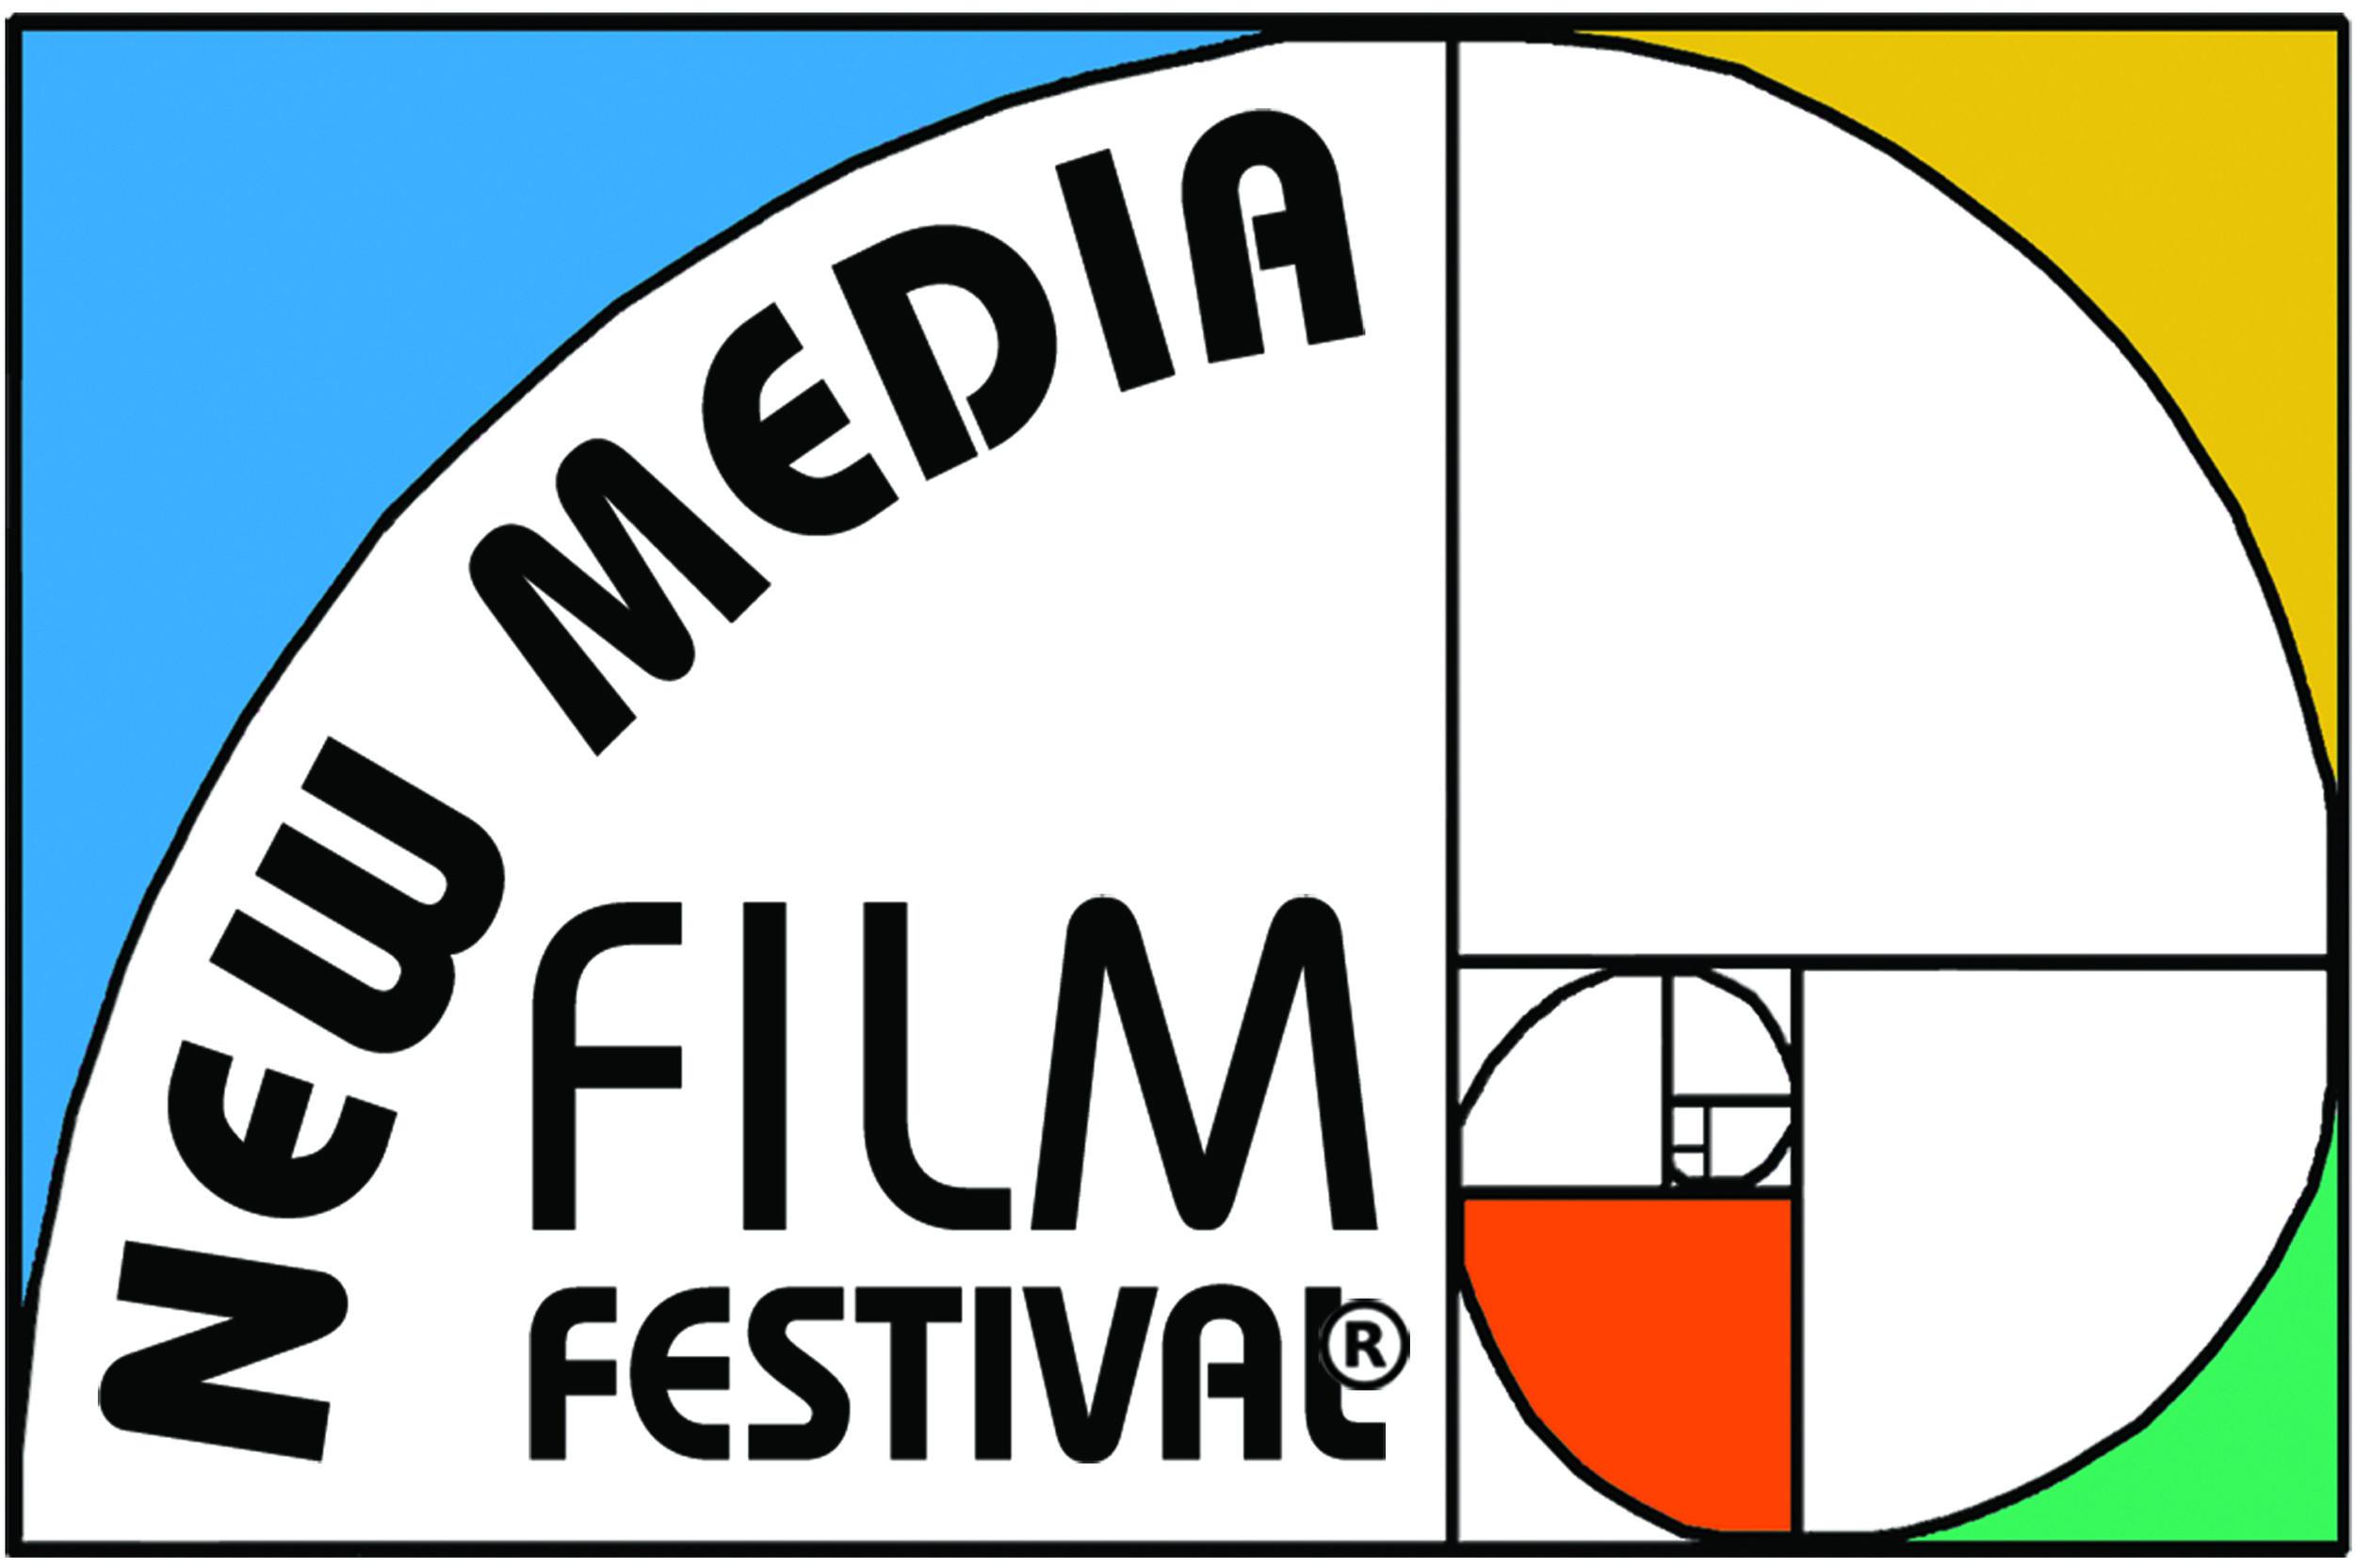 logo-text-new-2.jpg